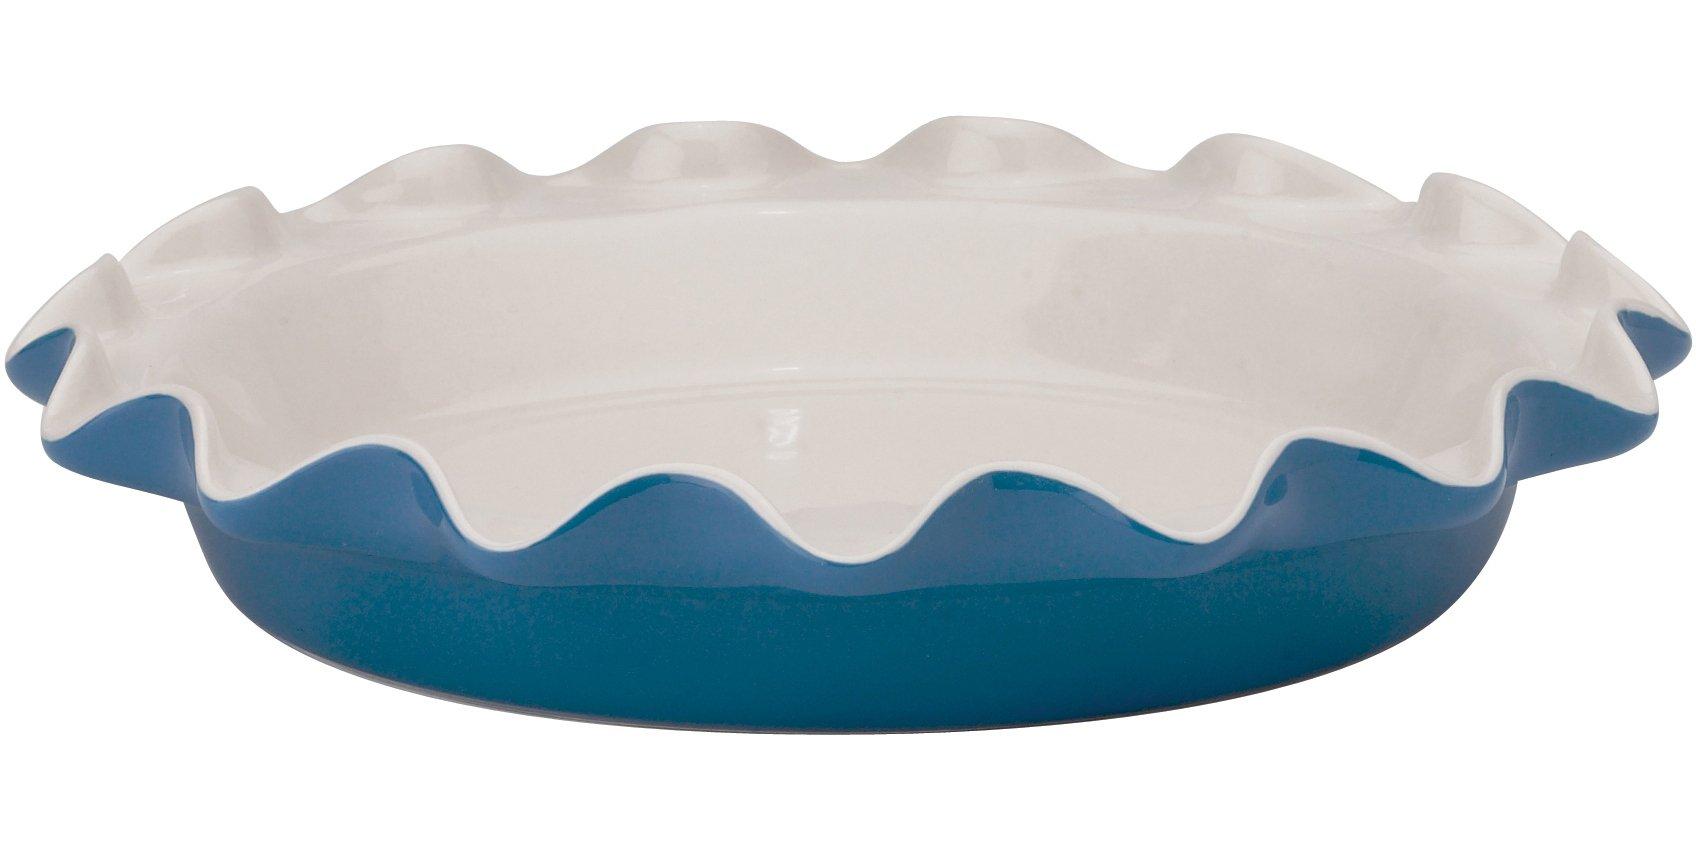 Rose Levy Beranbaum's Perfect Pie Plate, 9-Inch, Ceramic, Blueberry